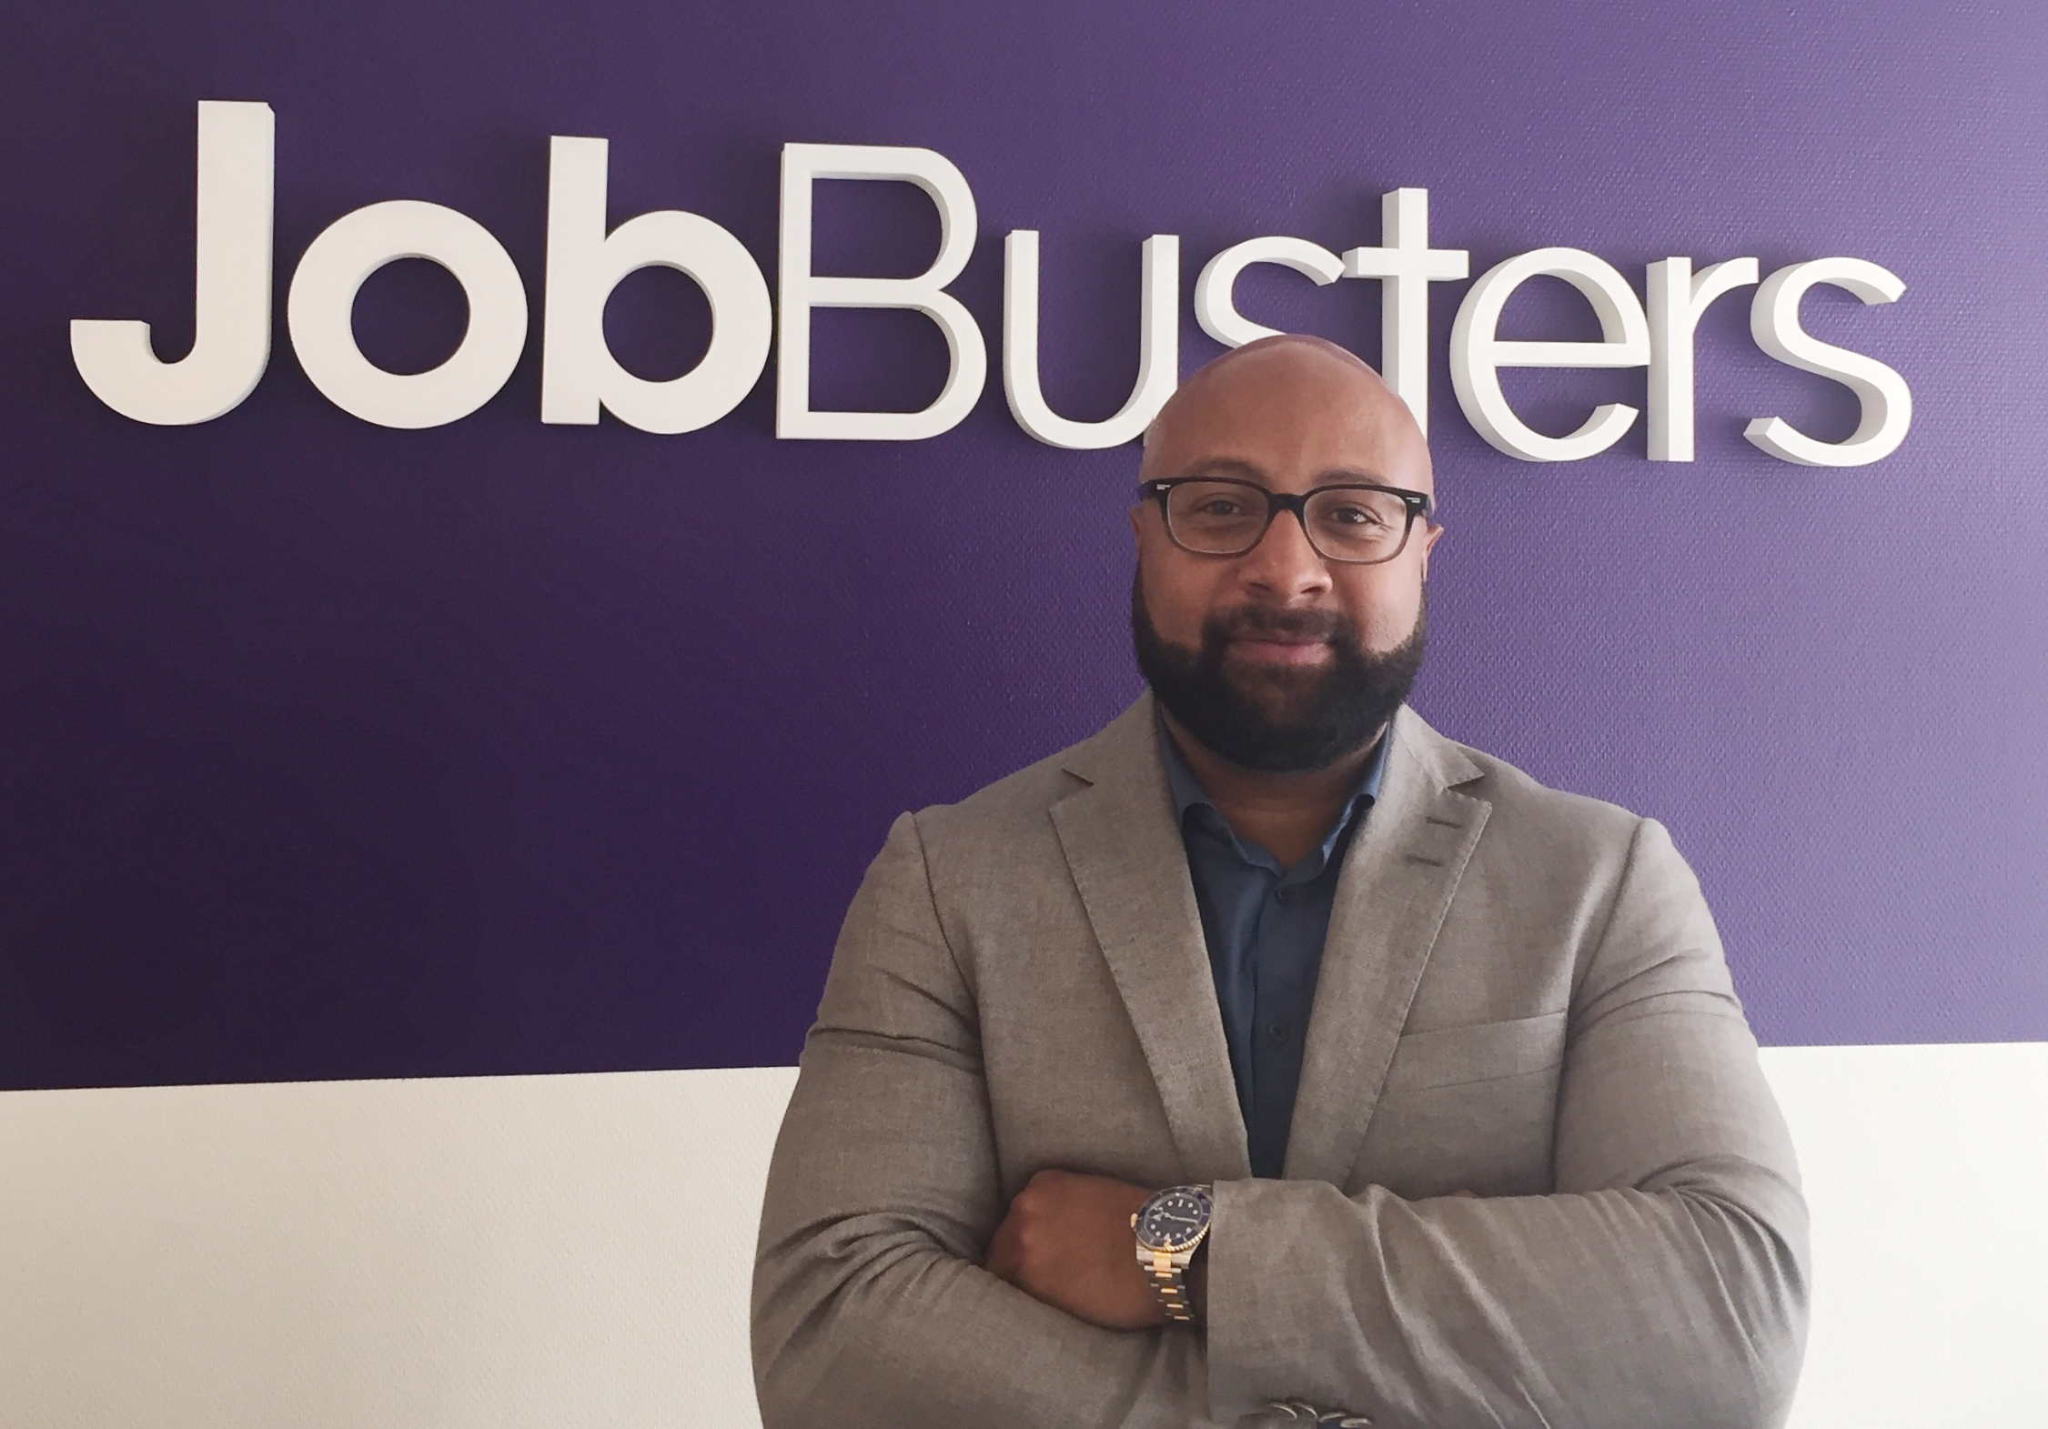 JobBusters2